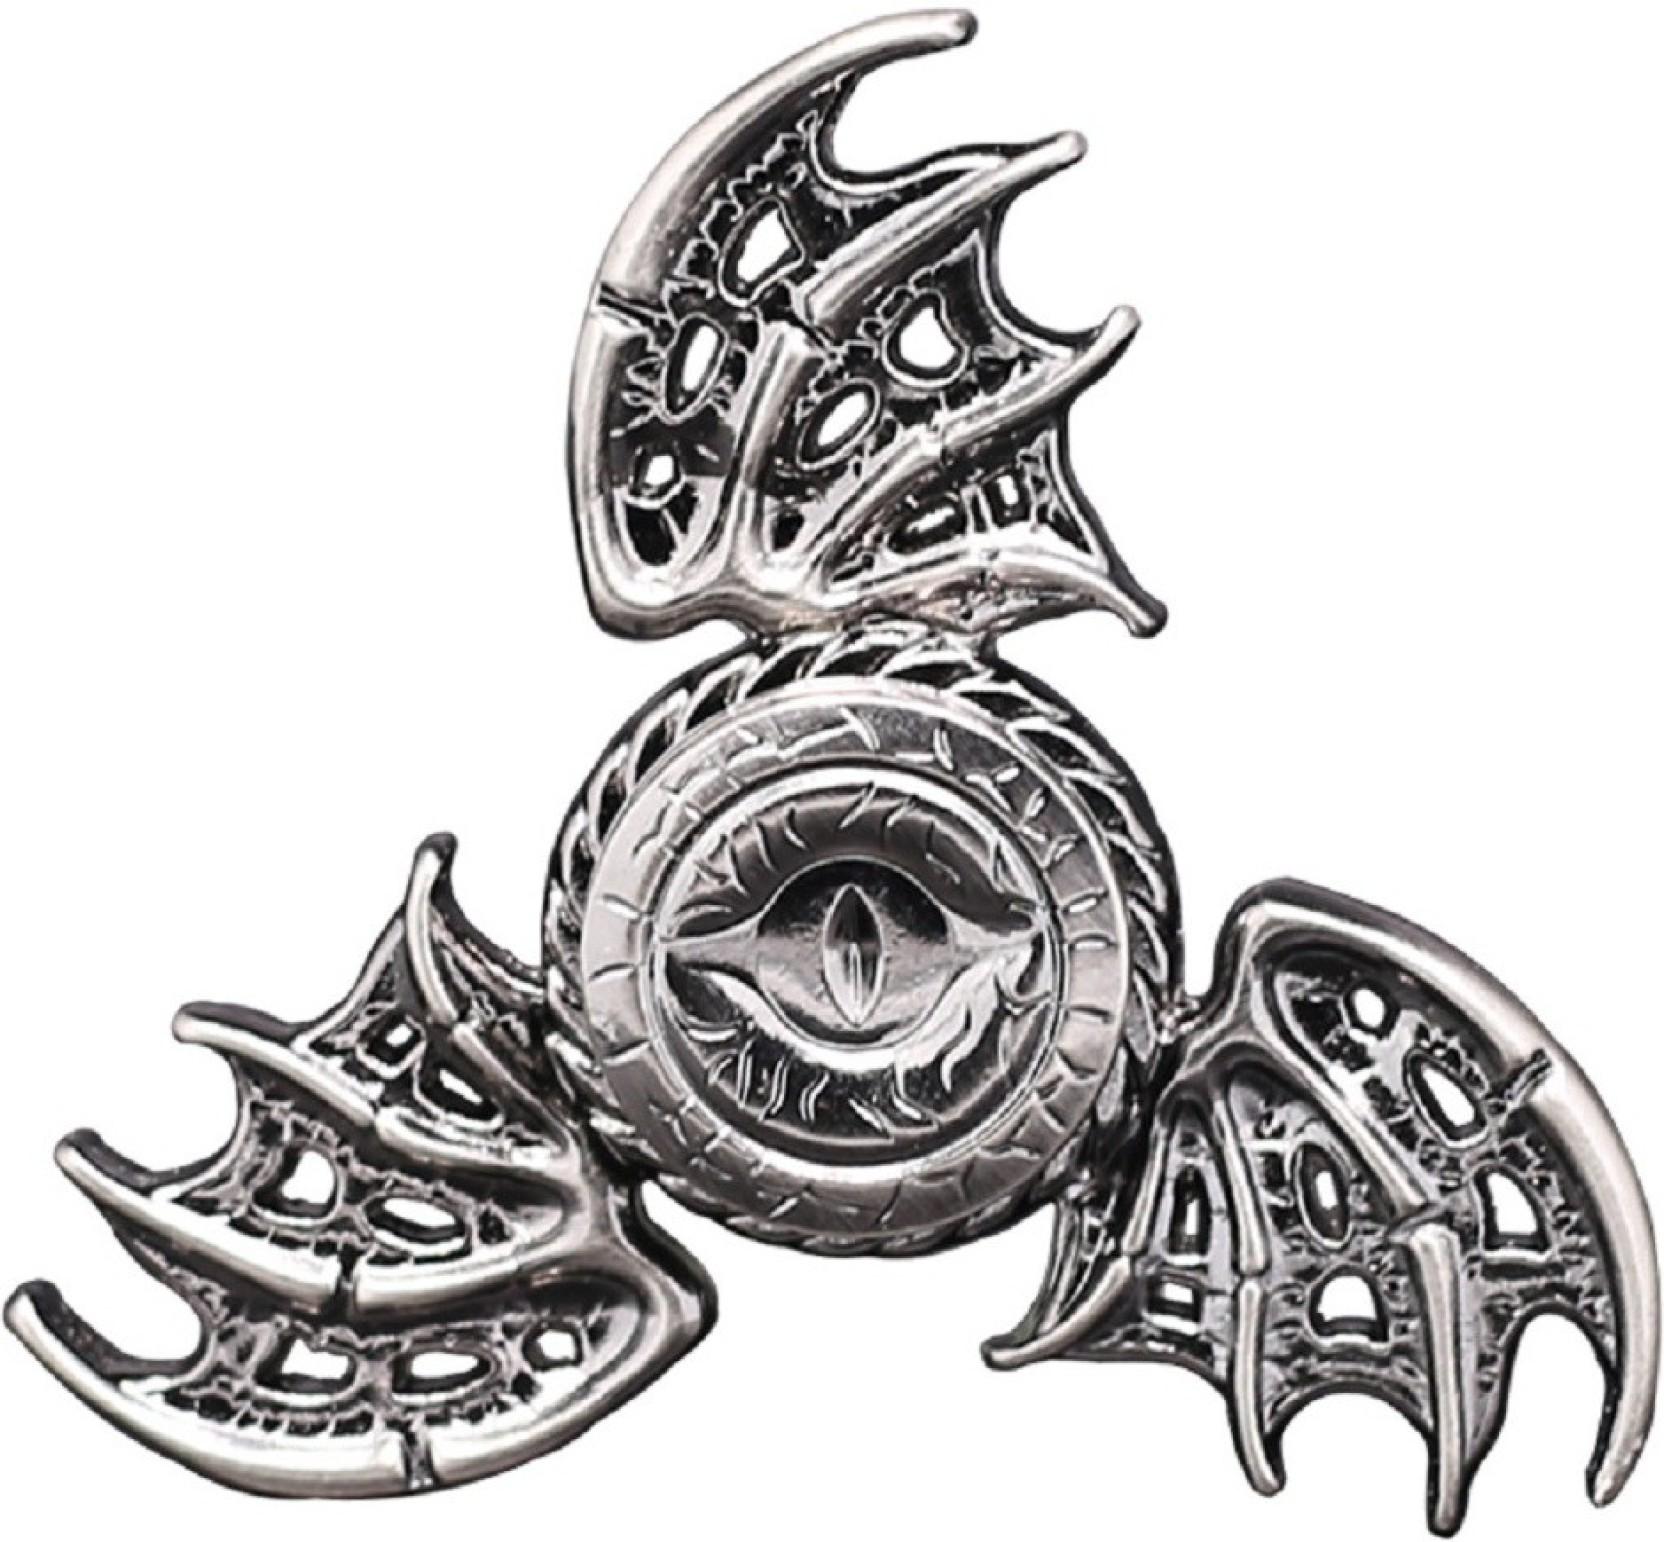 Venoo Metal Fidget Spinner Dragon Eye Game Of Thrones Unique Crescent Tri Bar Handspinner Home